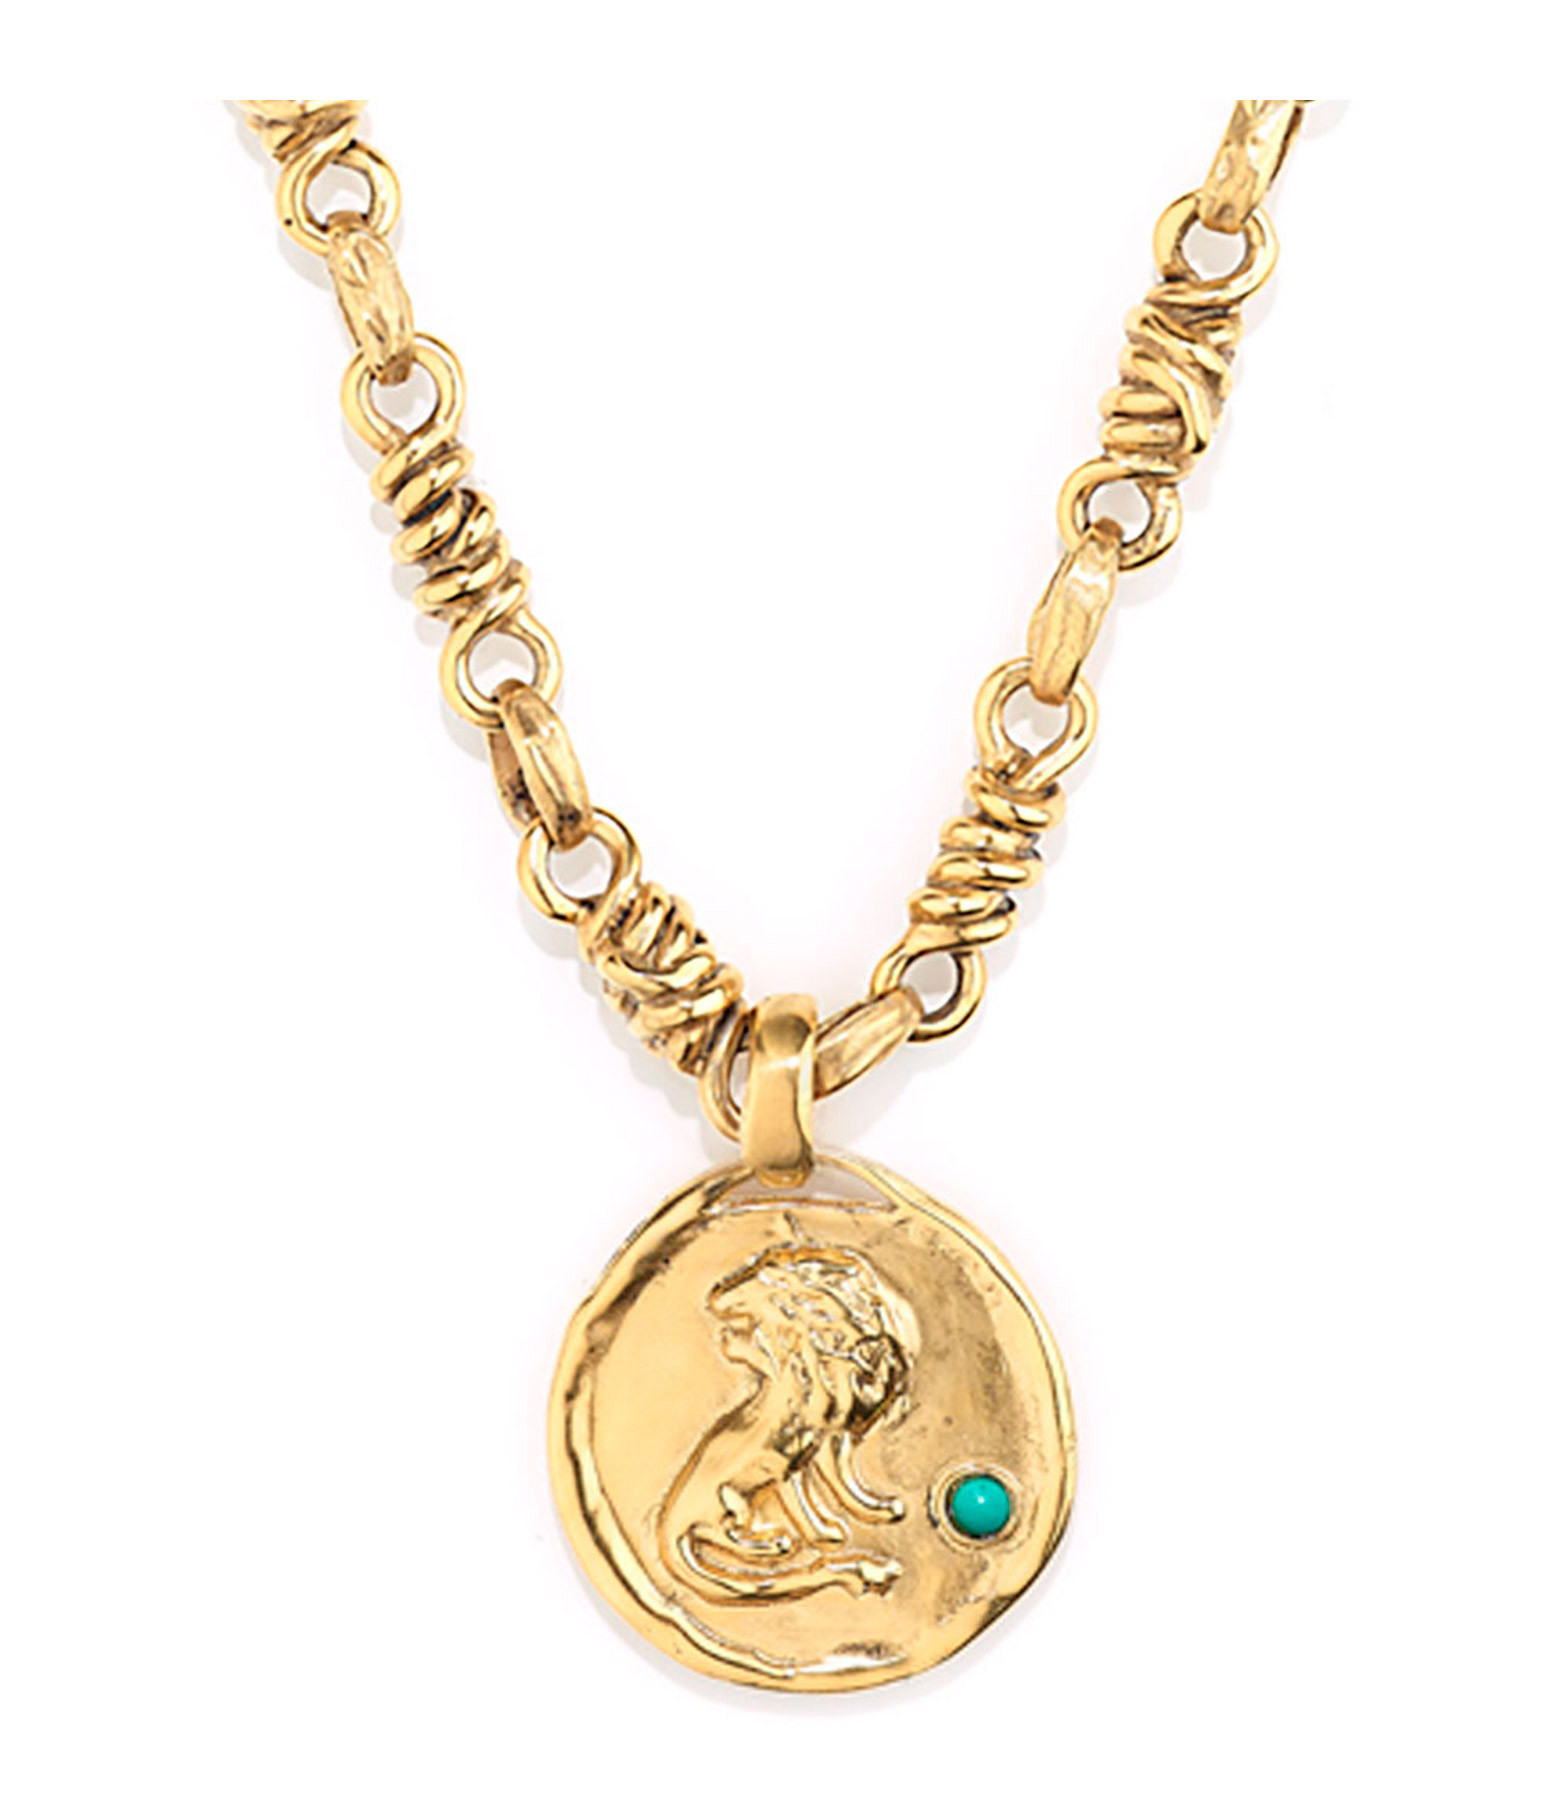 GOOSSENS - Collier Talisman Astro Lion Turquoise